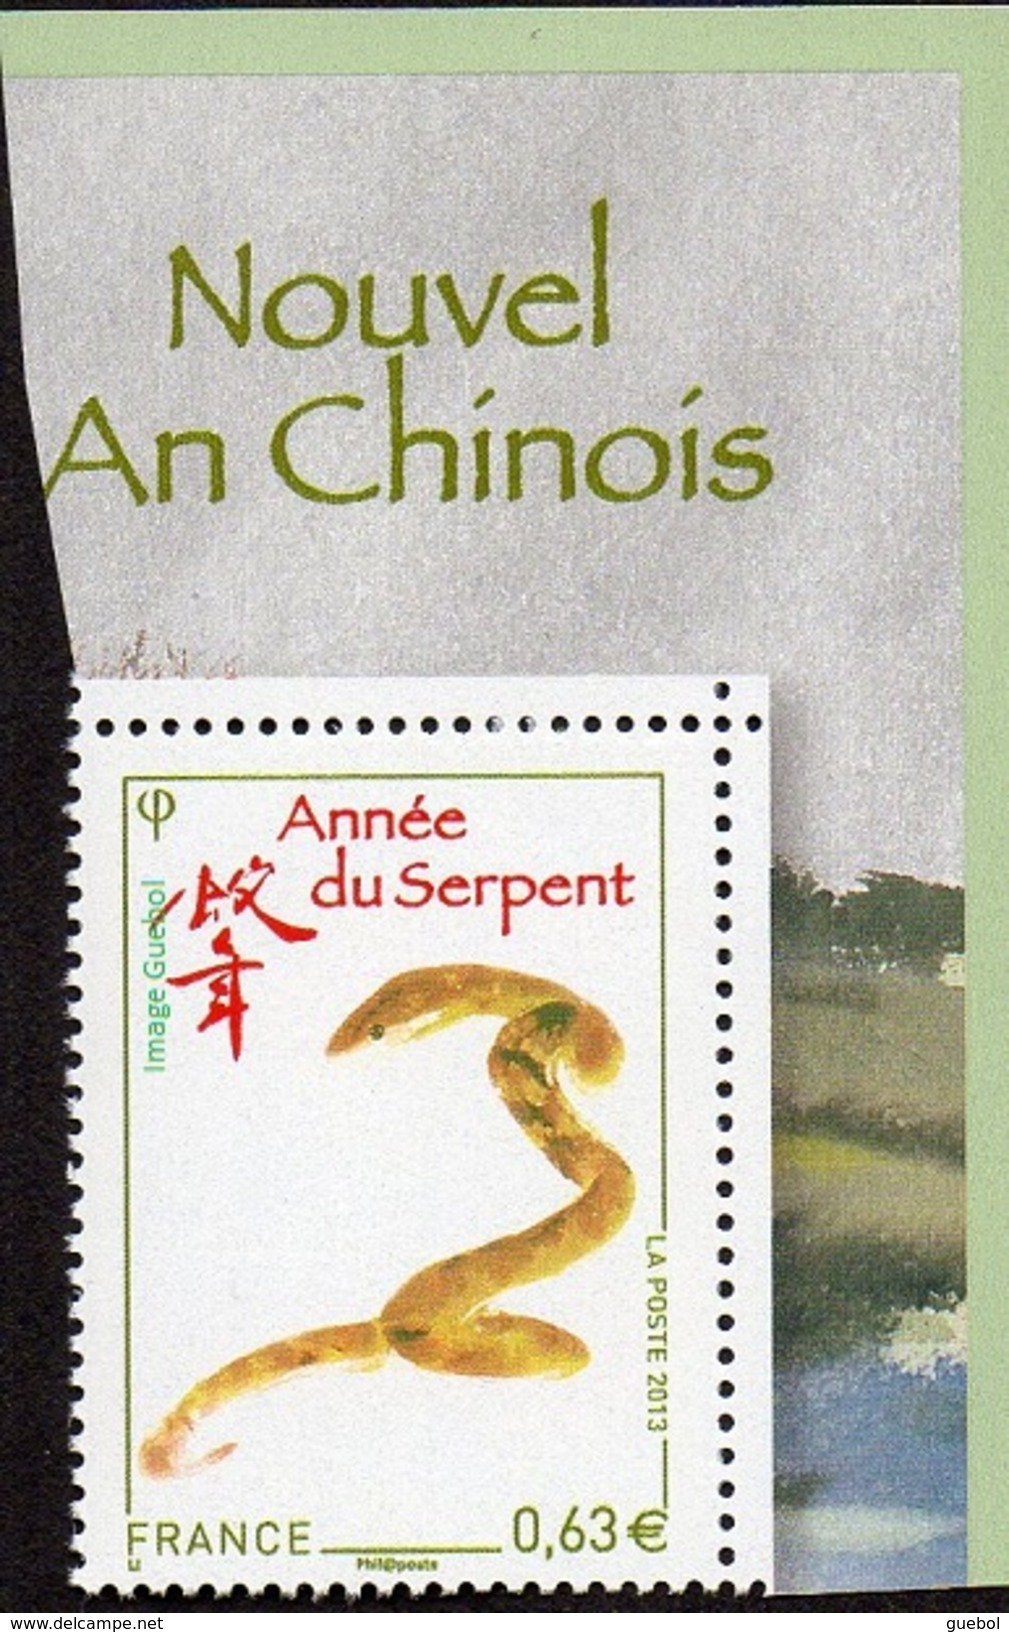 France N° 4712 ** Nouvel An Chinois 2013 - Année Du Serpent (animal - Animaux) - Hdf Droit - France